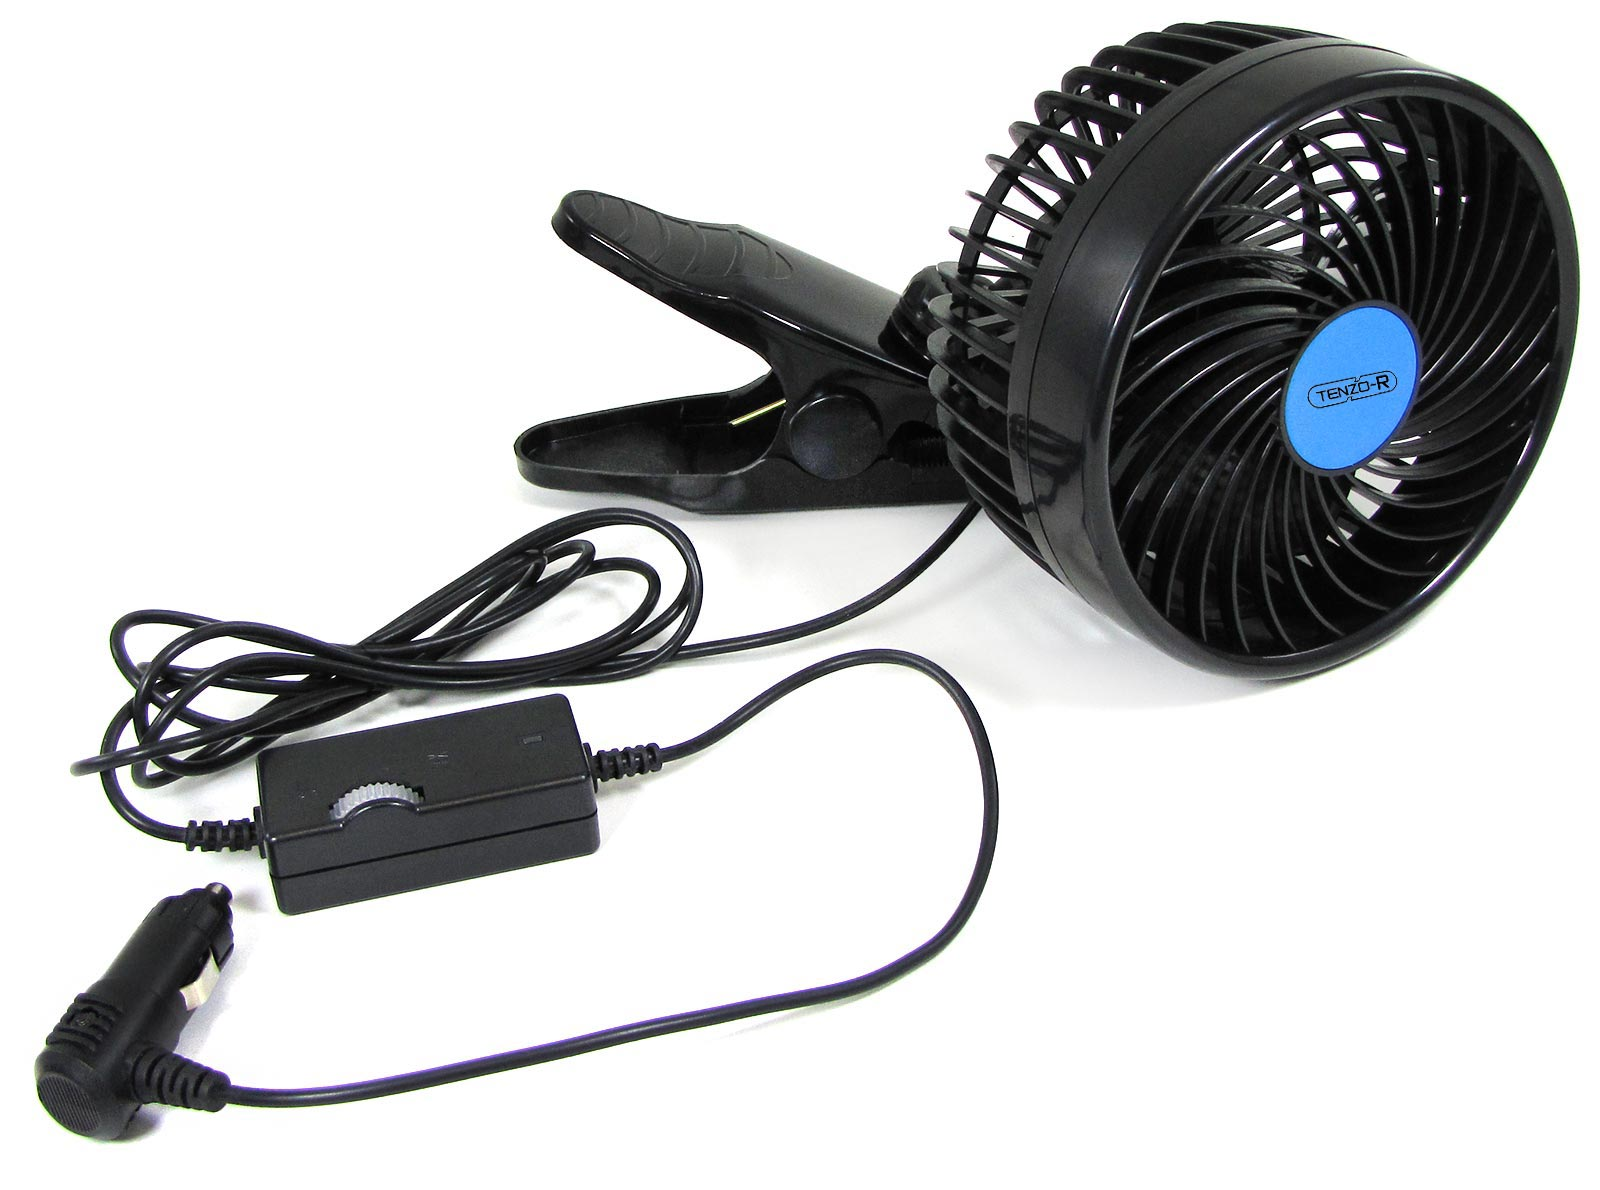 Kühlschrank Ventilator : Ventilator lüfter mit 3mm achse f61 12 kühlschrank liebherr 6118785